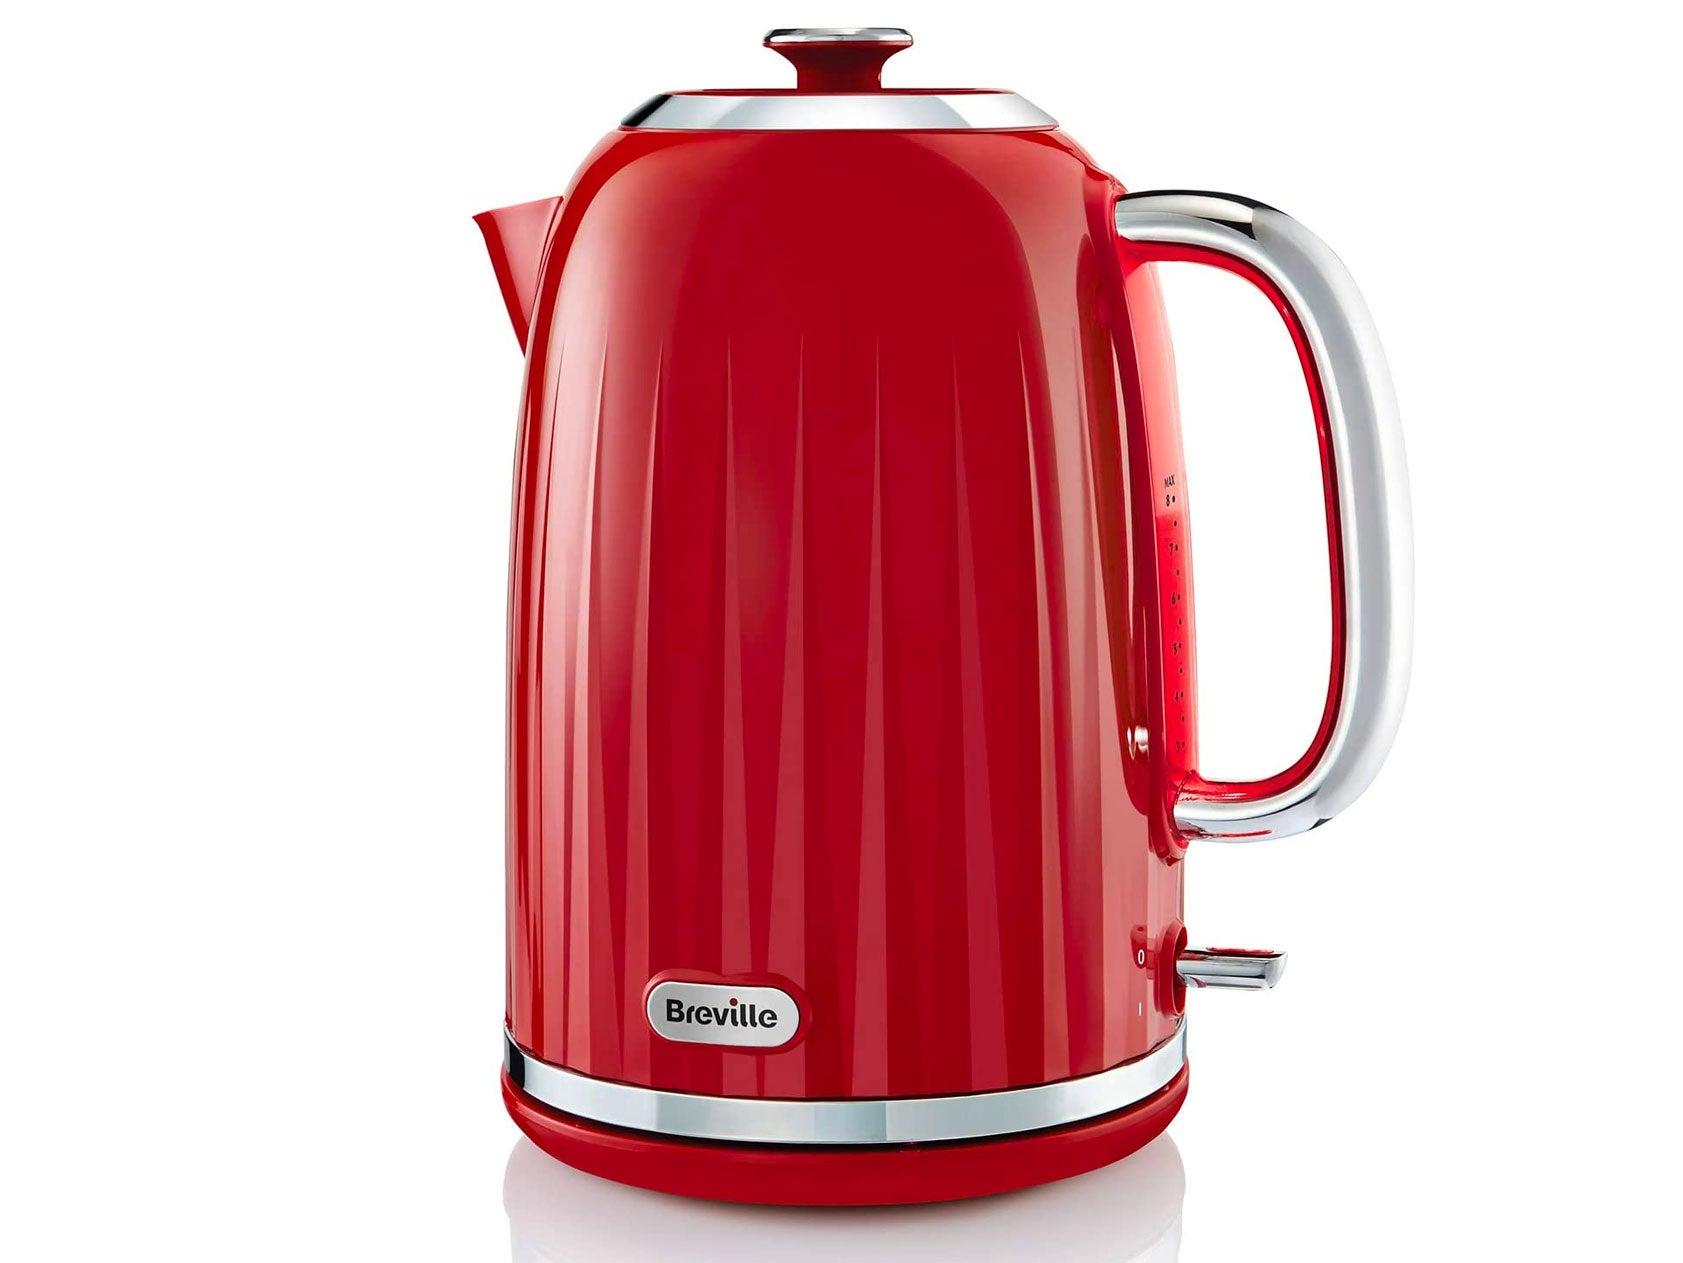 Breville Impressions Electric Kettle, 1.7 Litre, 3 KW Fast Boil, Red